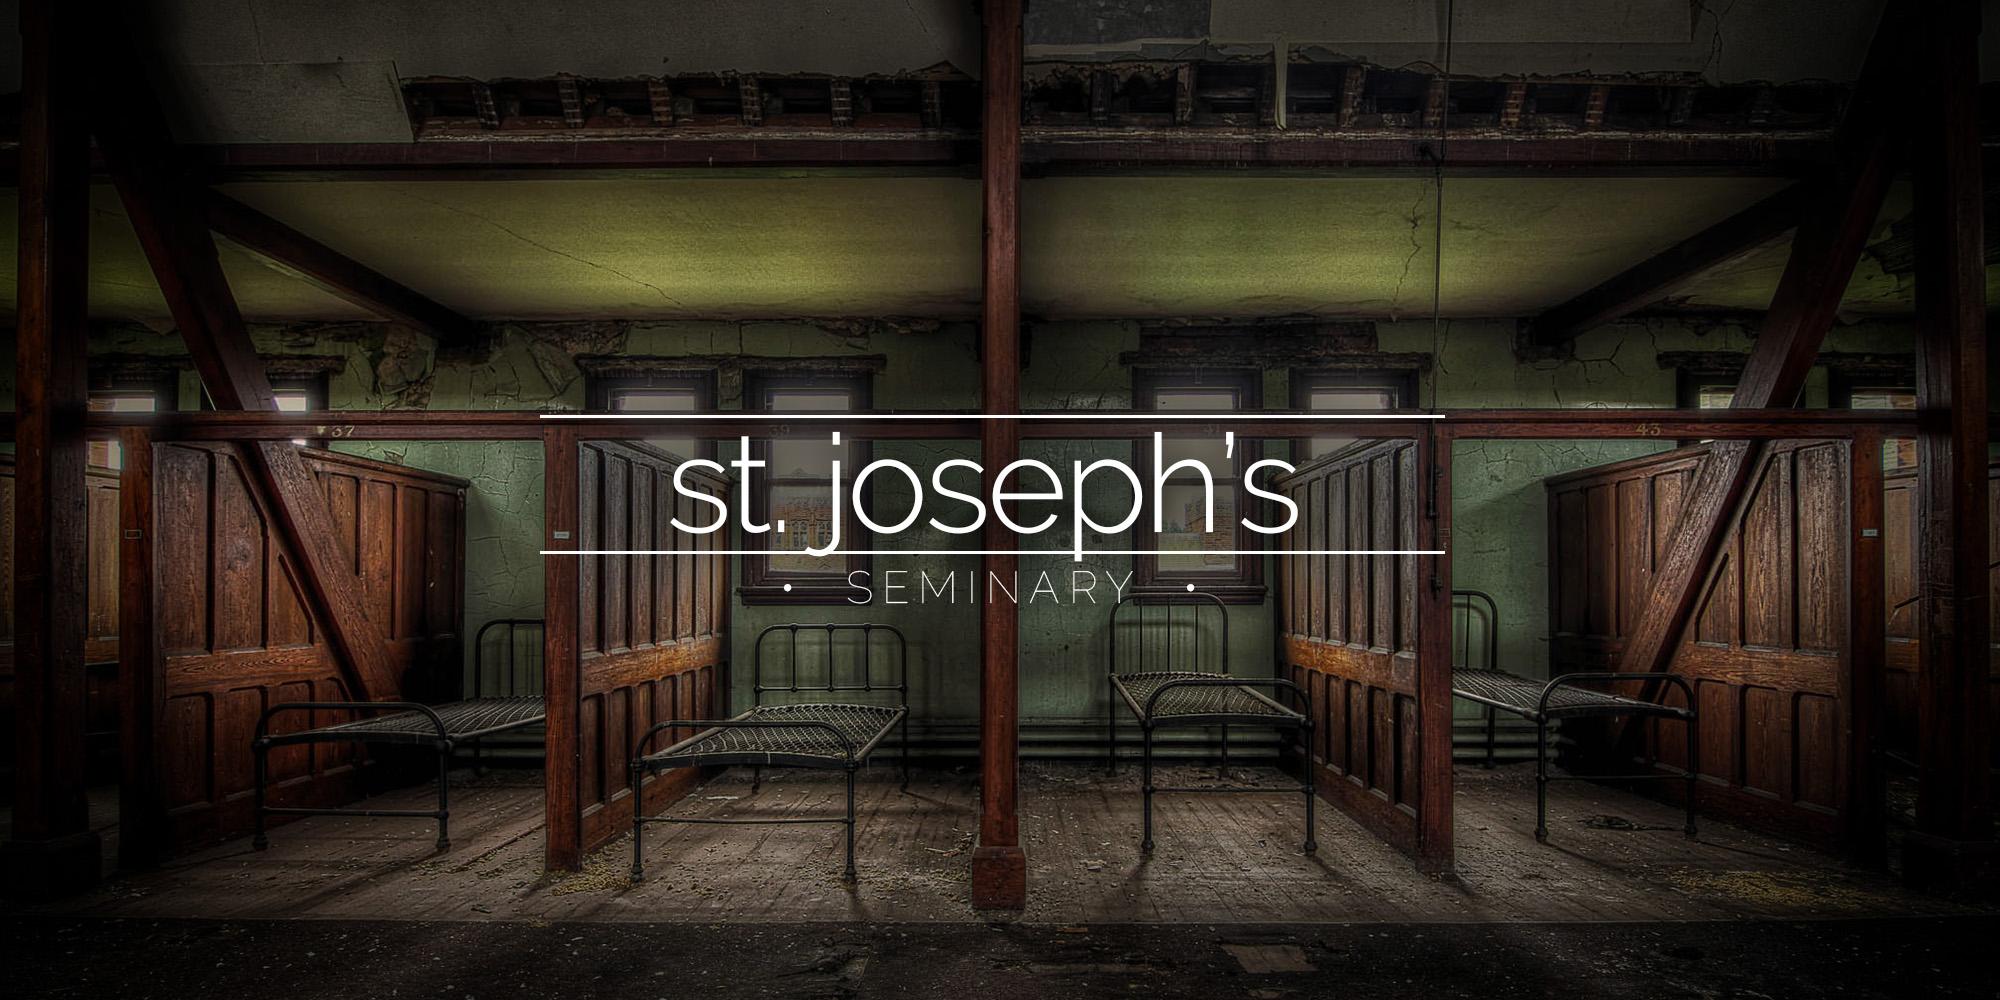 St Joseph's Seminary Upholland